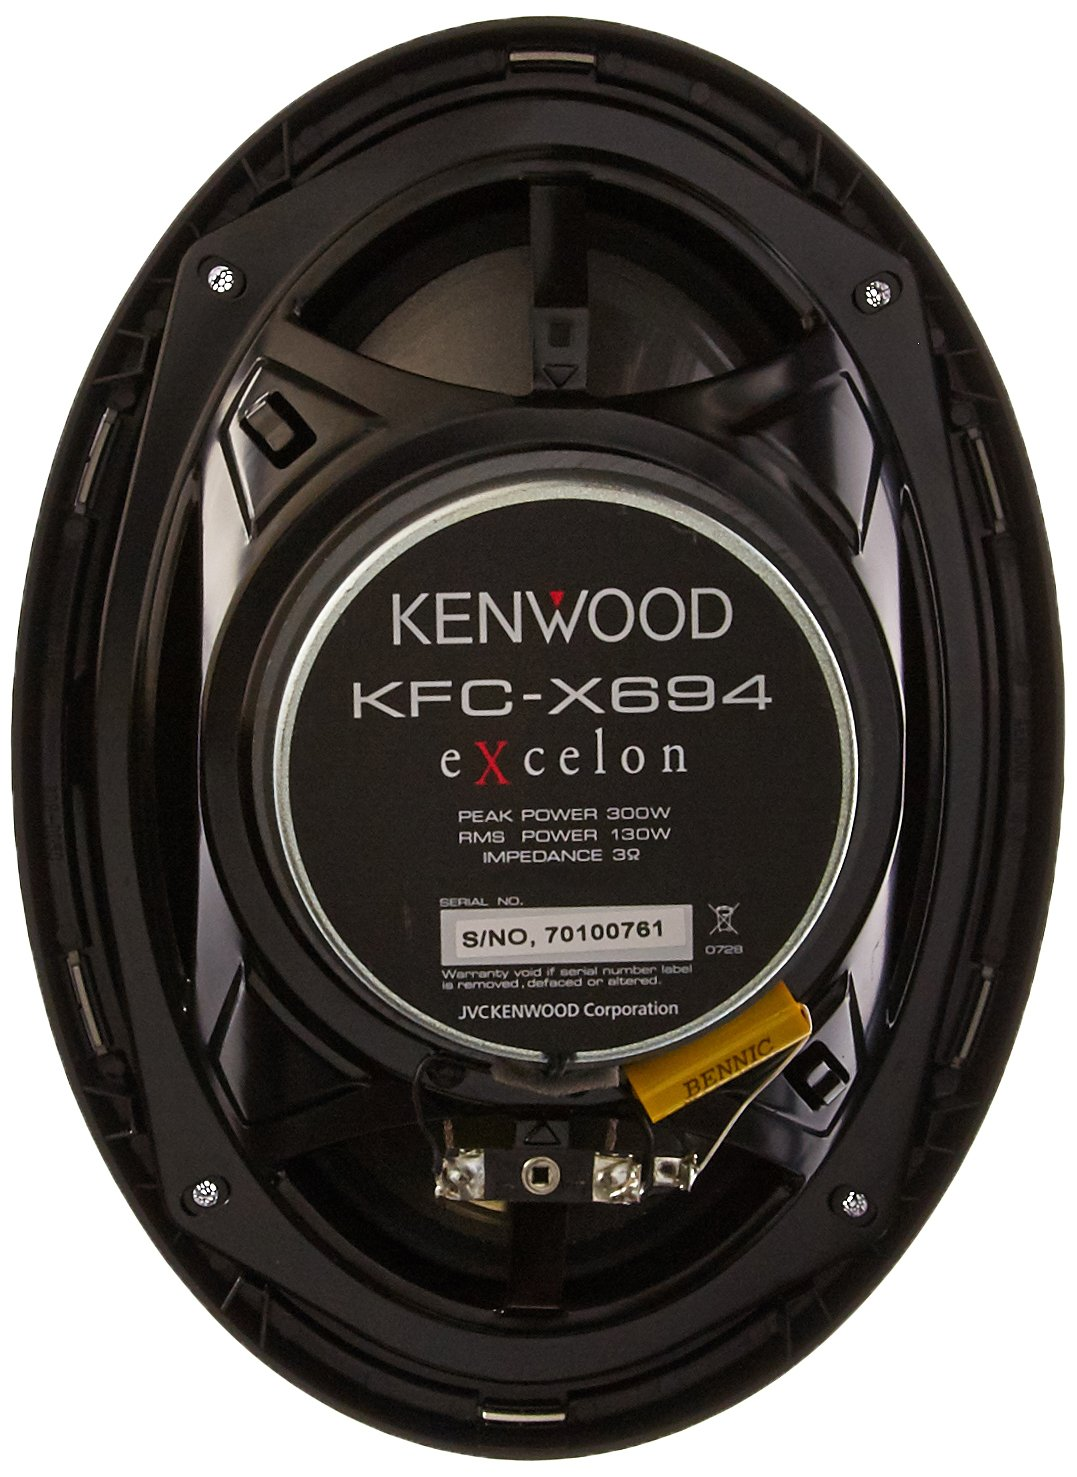 Kenwood Exelon KFC-X694 6X9 2 WayCar Speakers Cache Bundle-Kenwood